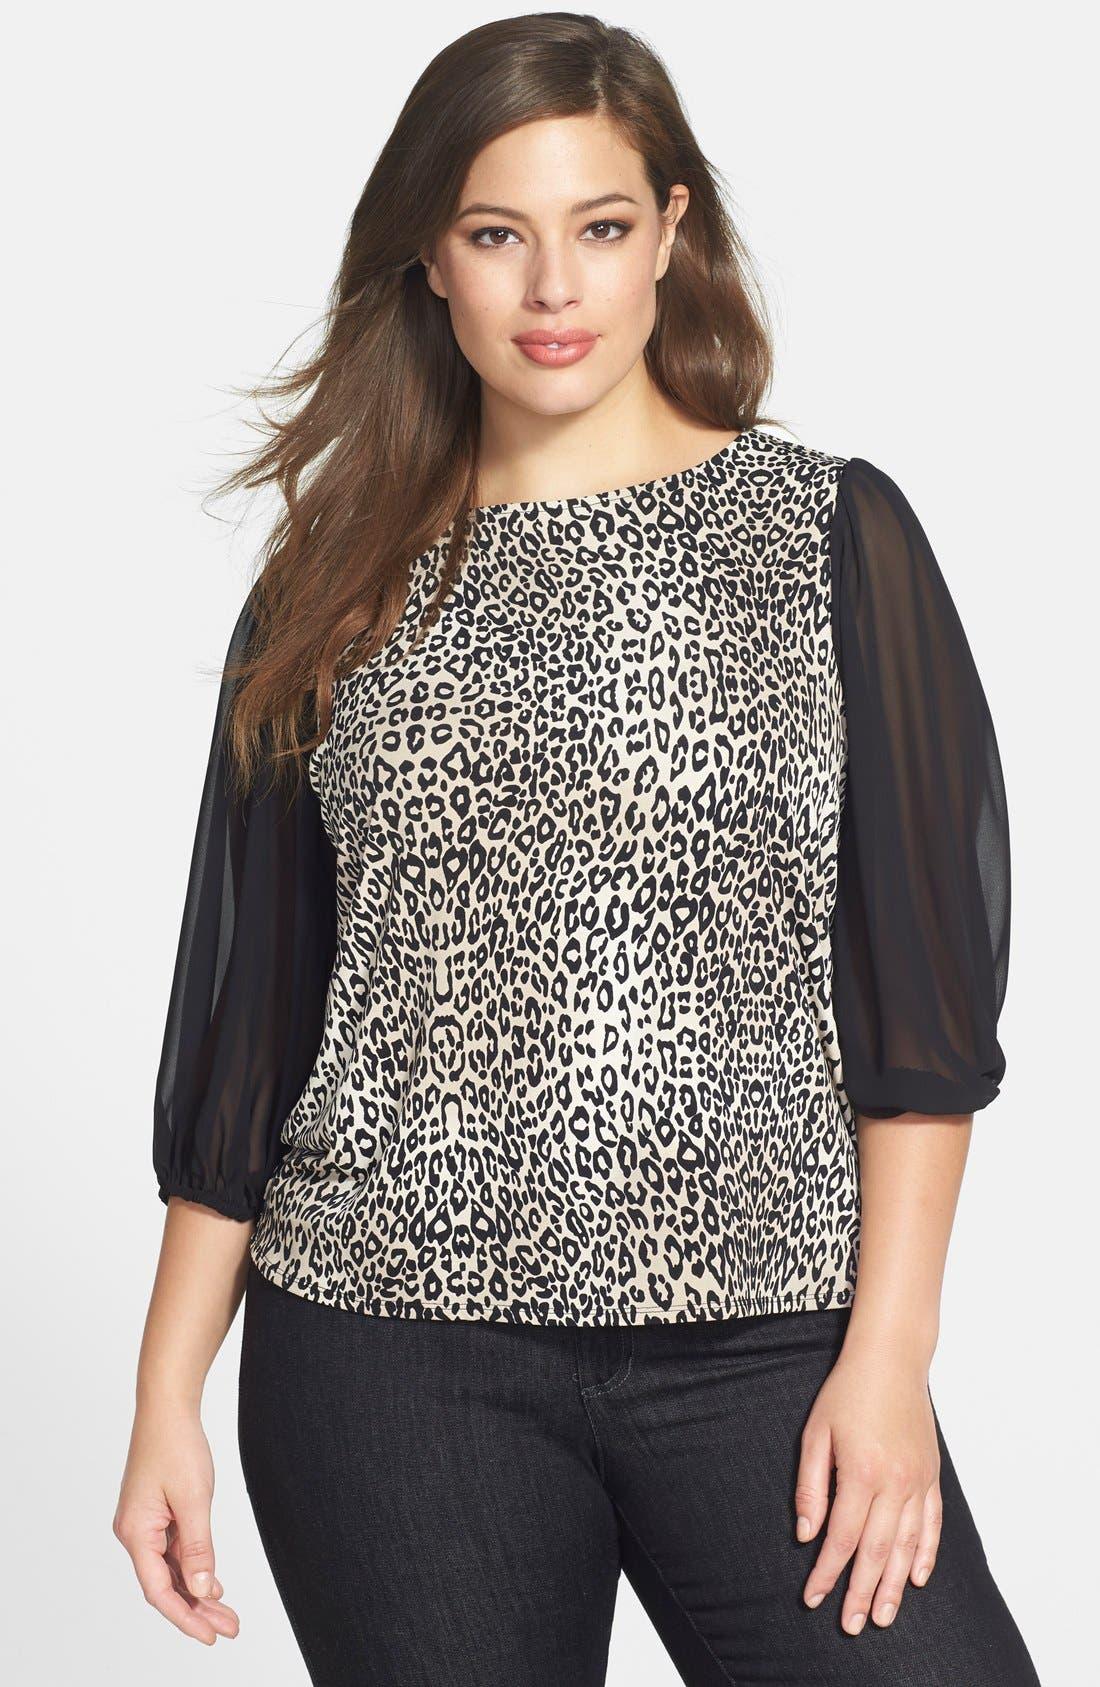 Main Image - Vince Camuto 'Desert Leopard' Chiffon Sleeve Top (Plus Size)